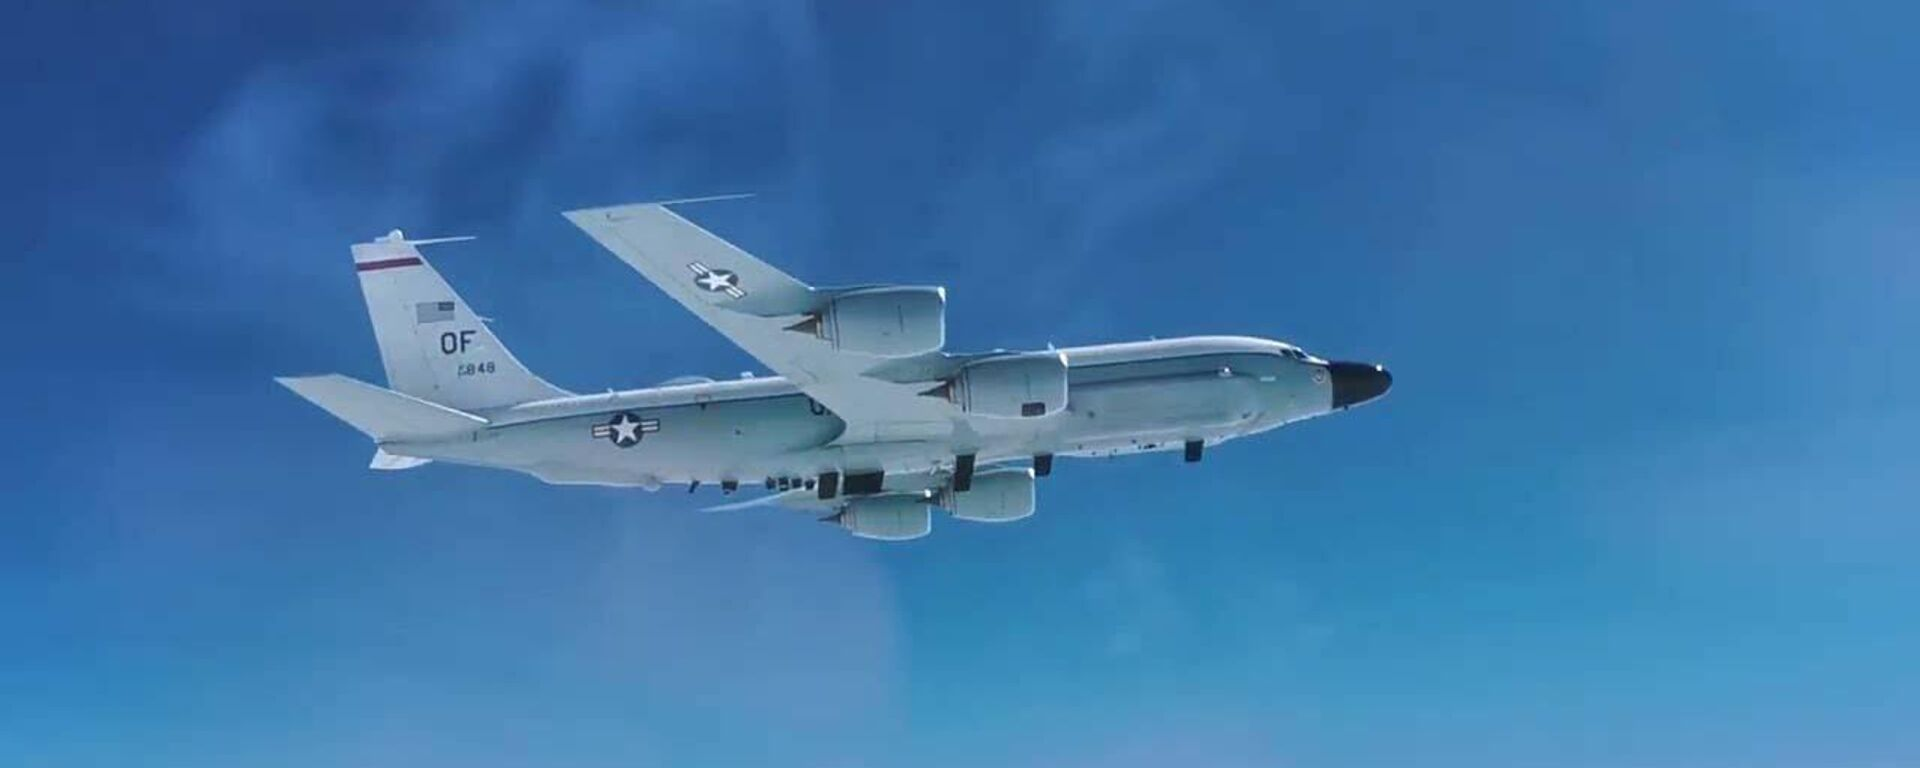 Кадры перехвата истребителем МиГ-31 самолета-разведчика США - Sputnik Таджикистан, 1920, 16.04.2021